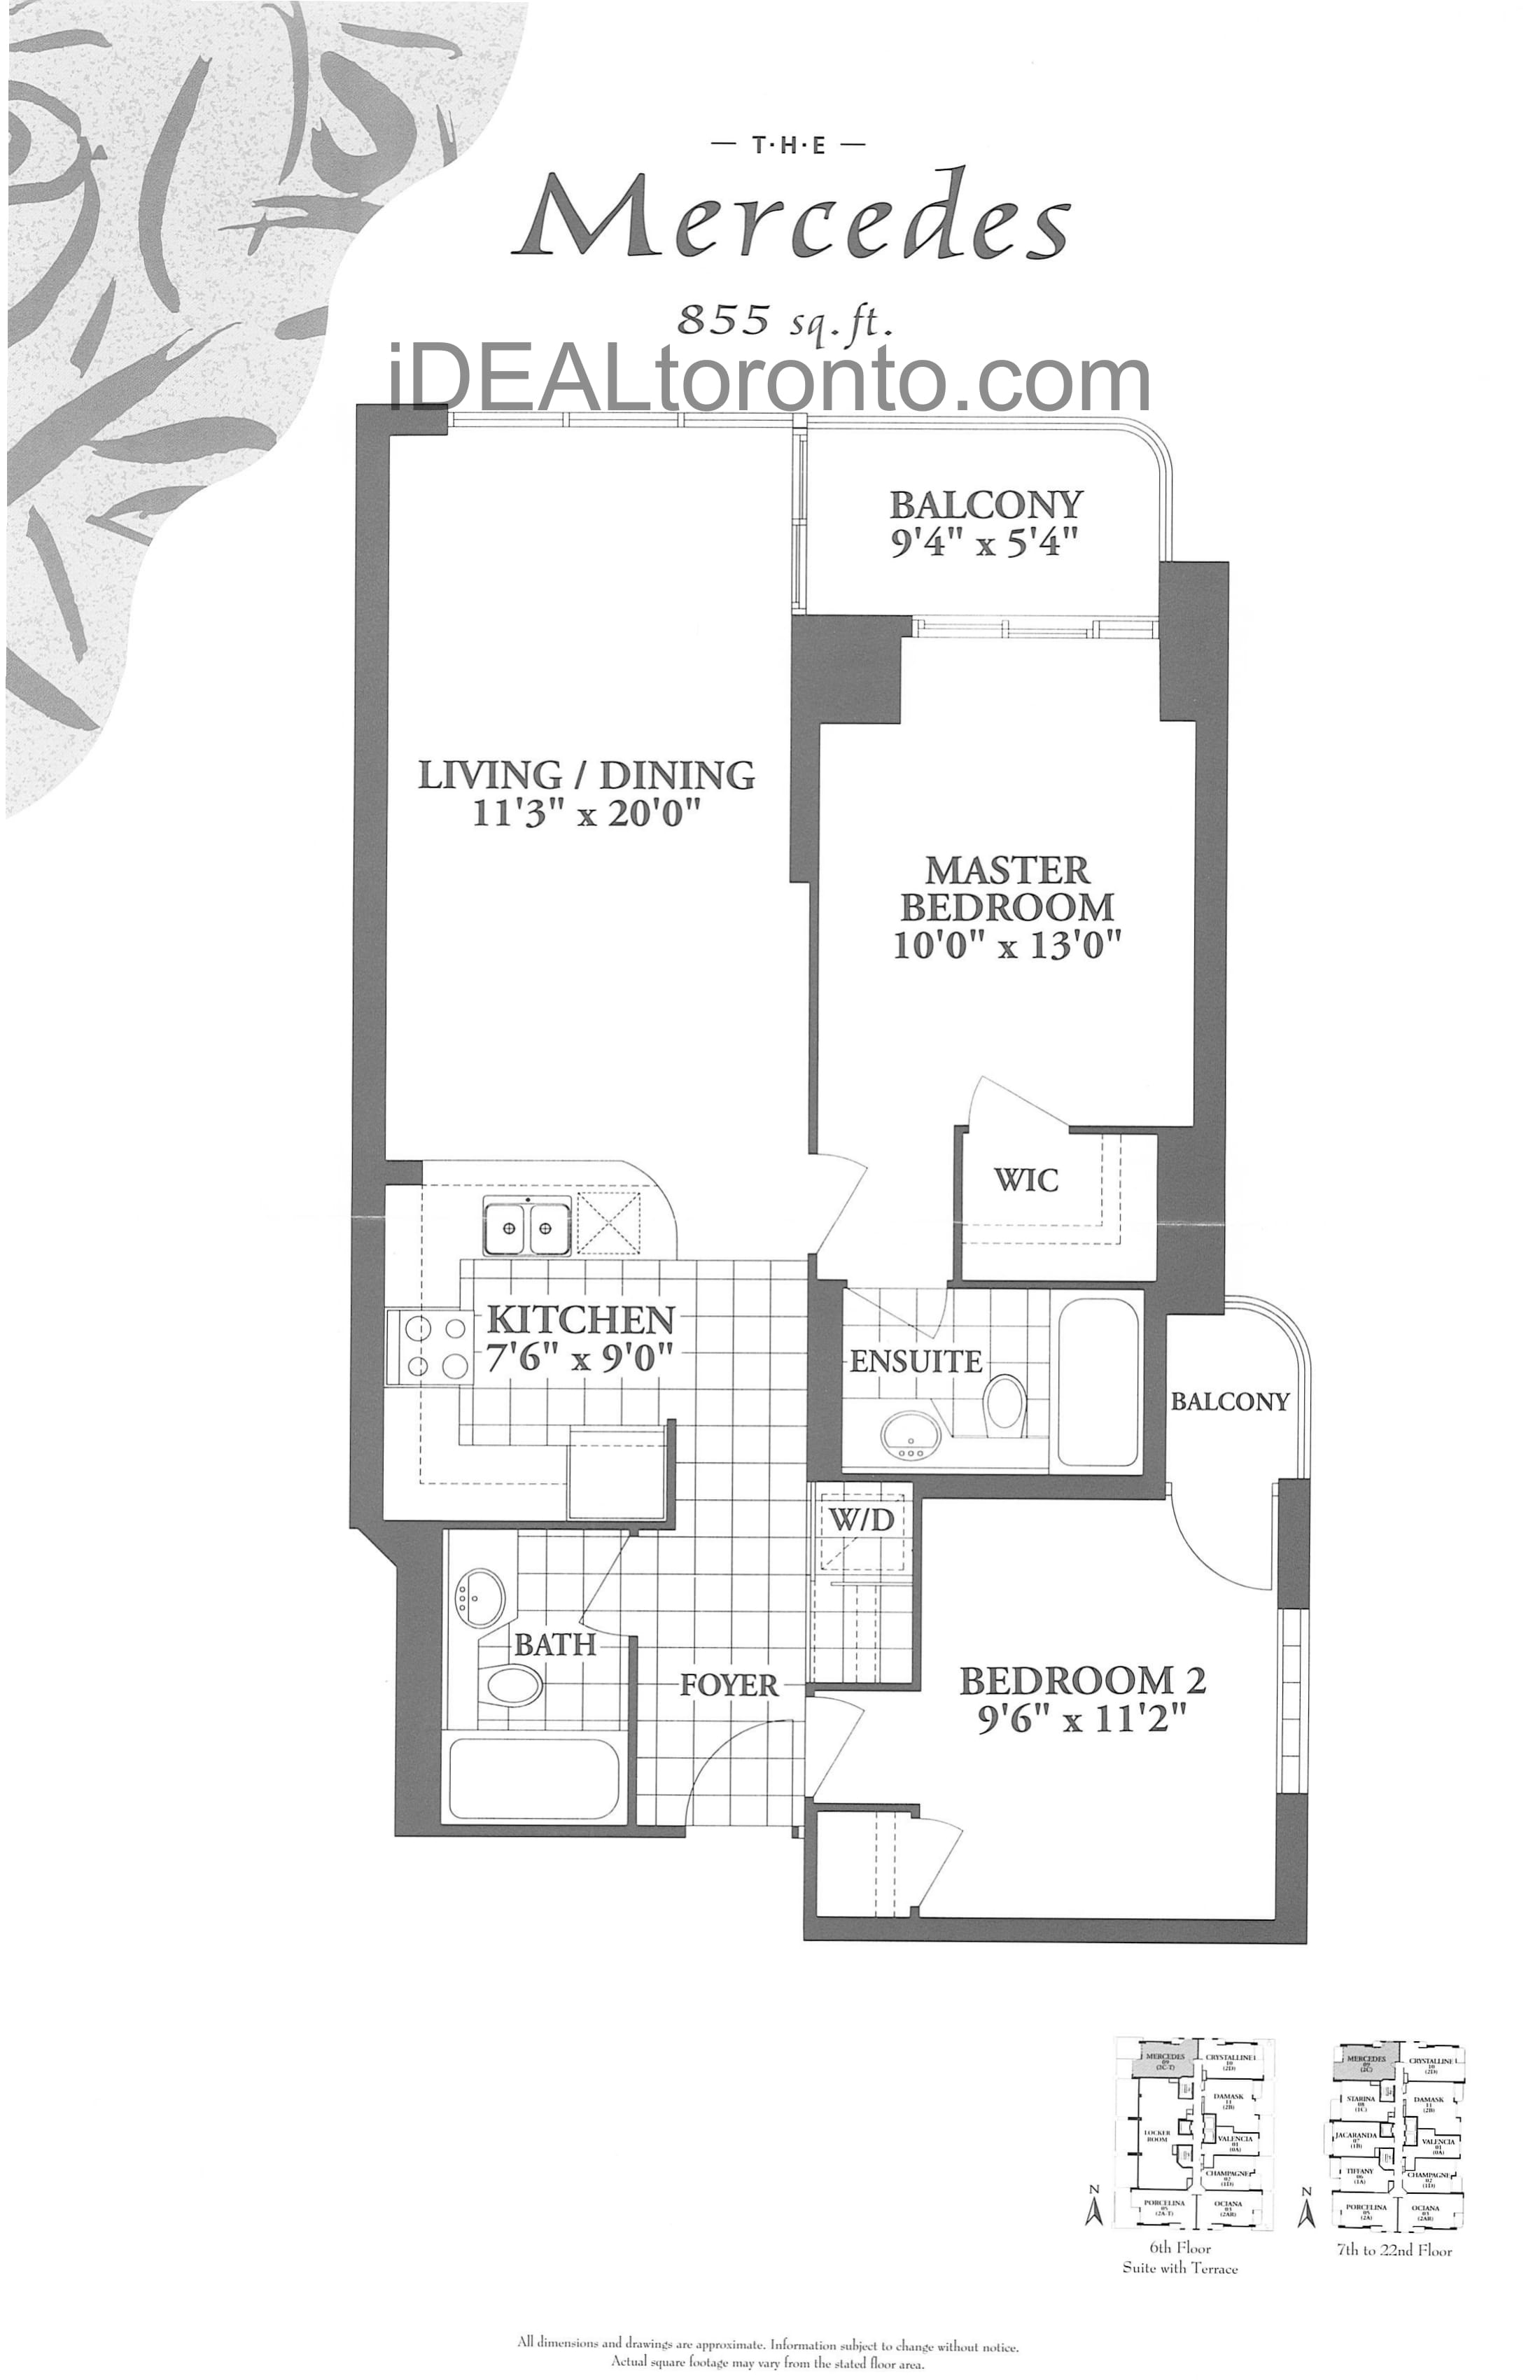 The Mercedes: 2 Bedroom, 855 SqFt